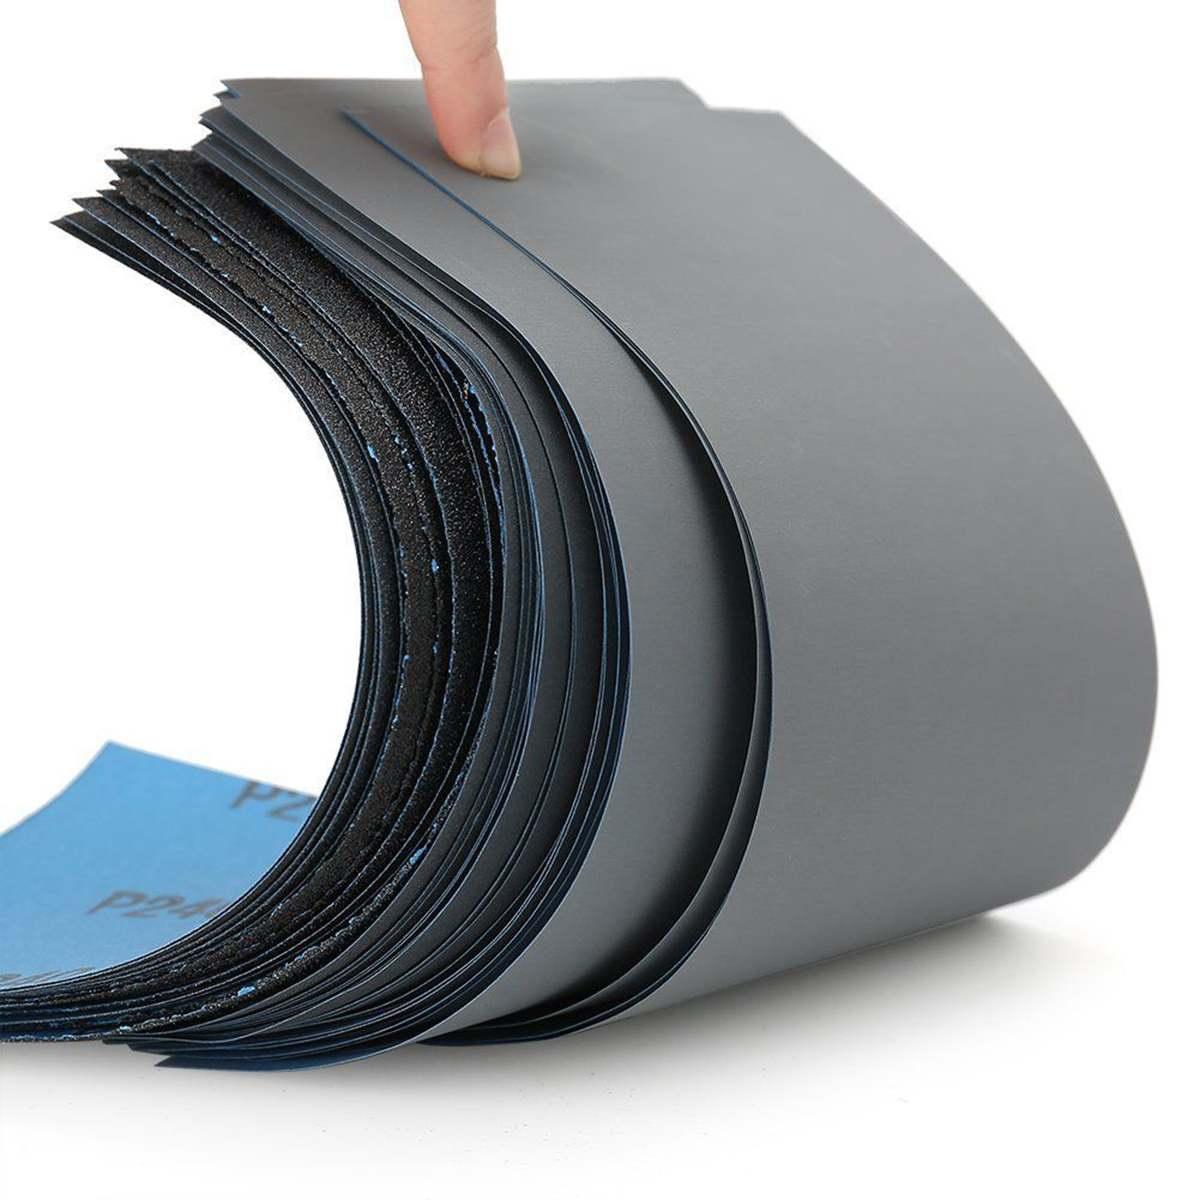 45PCS  Wet Dry Sandpaper, High Grit 120-5000 Sandpaper Sheets Assortment For Wood Metal Polishing Automoti